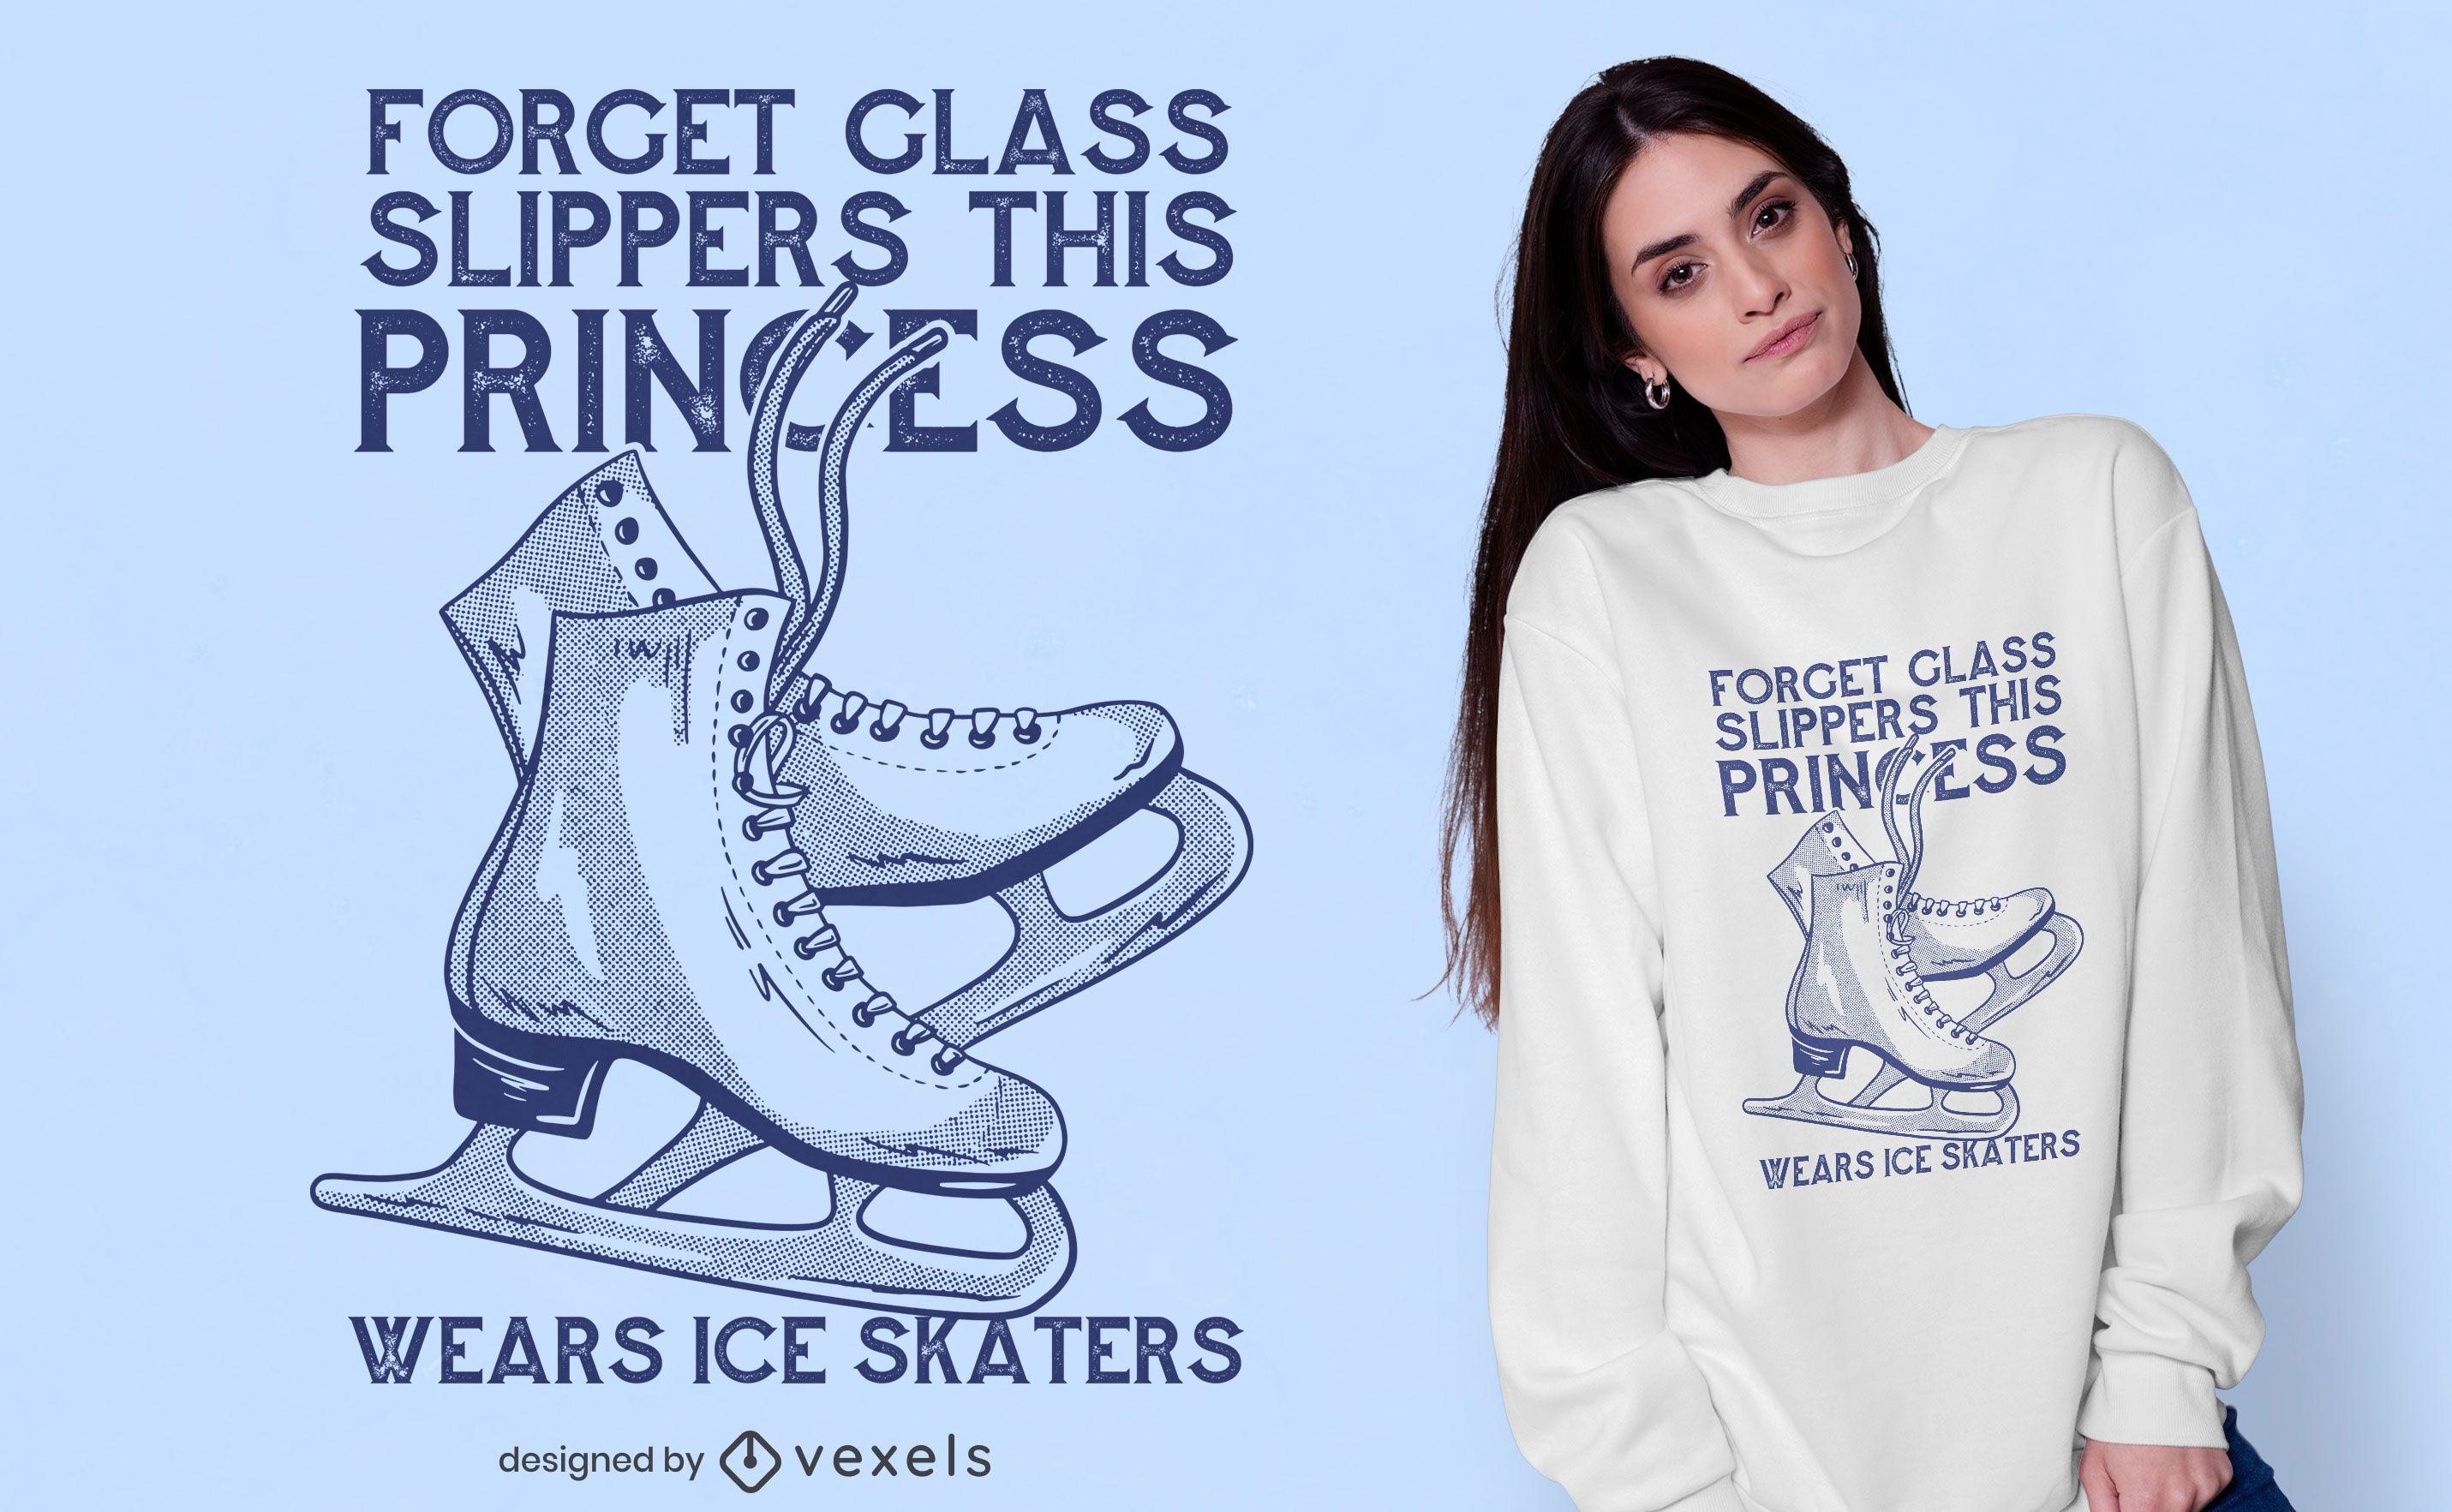 Ice skating princess t-shirt design